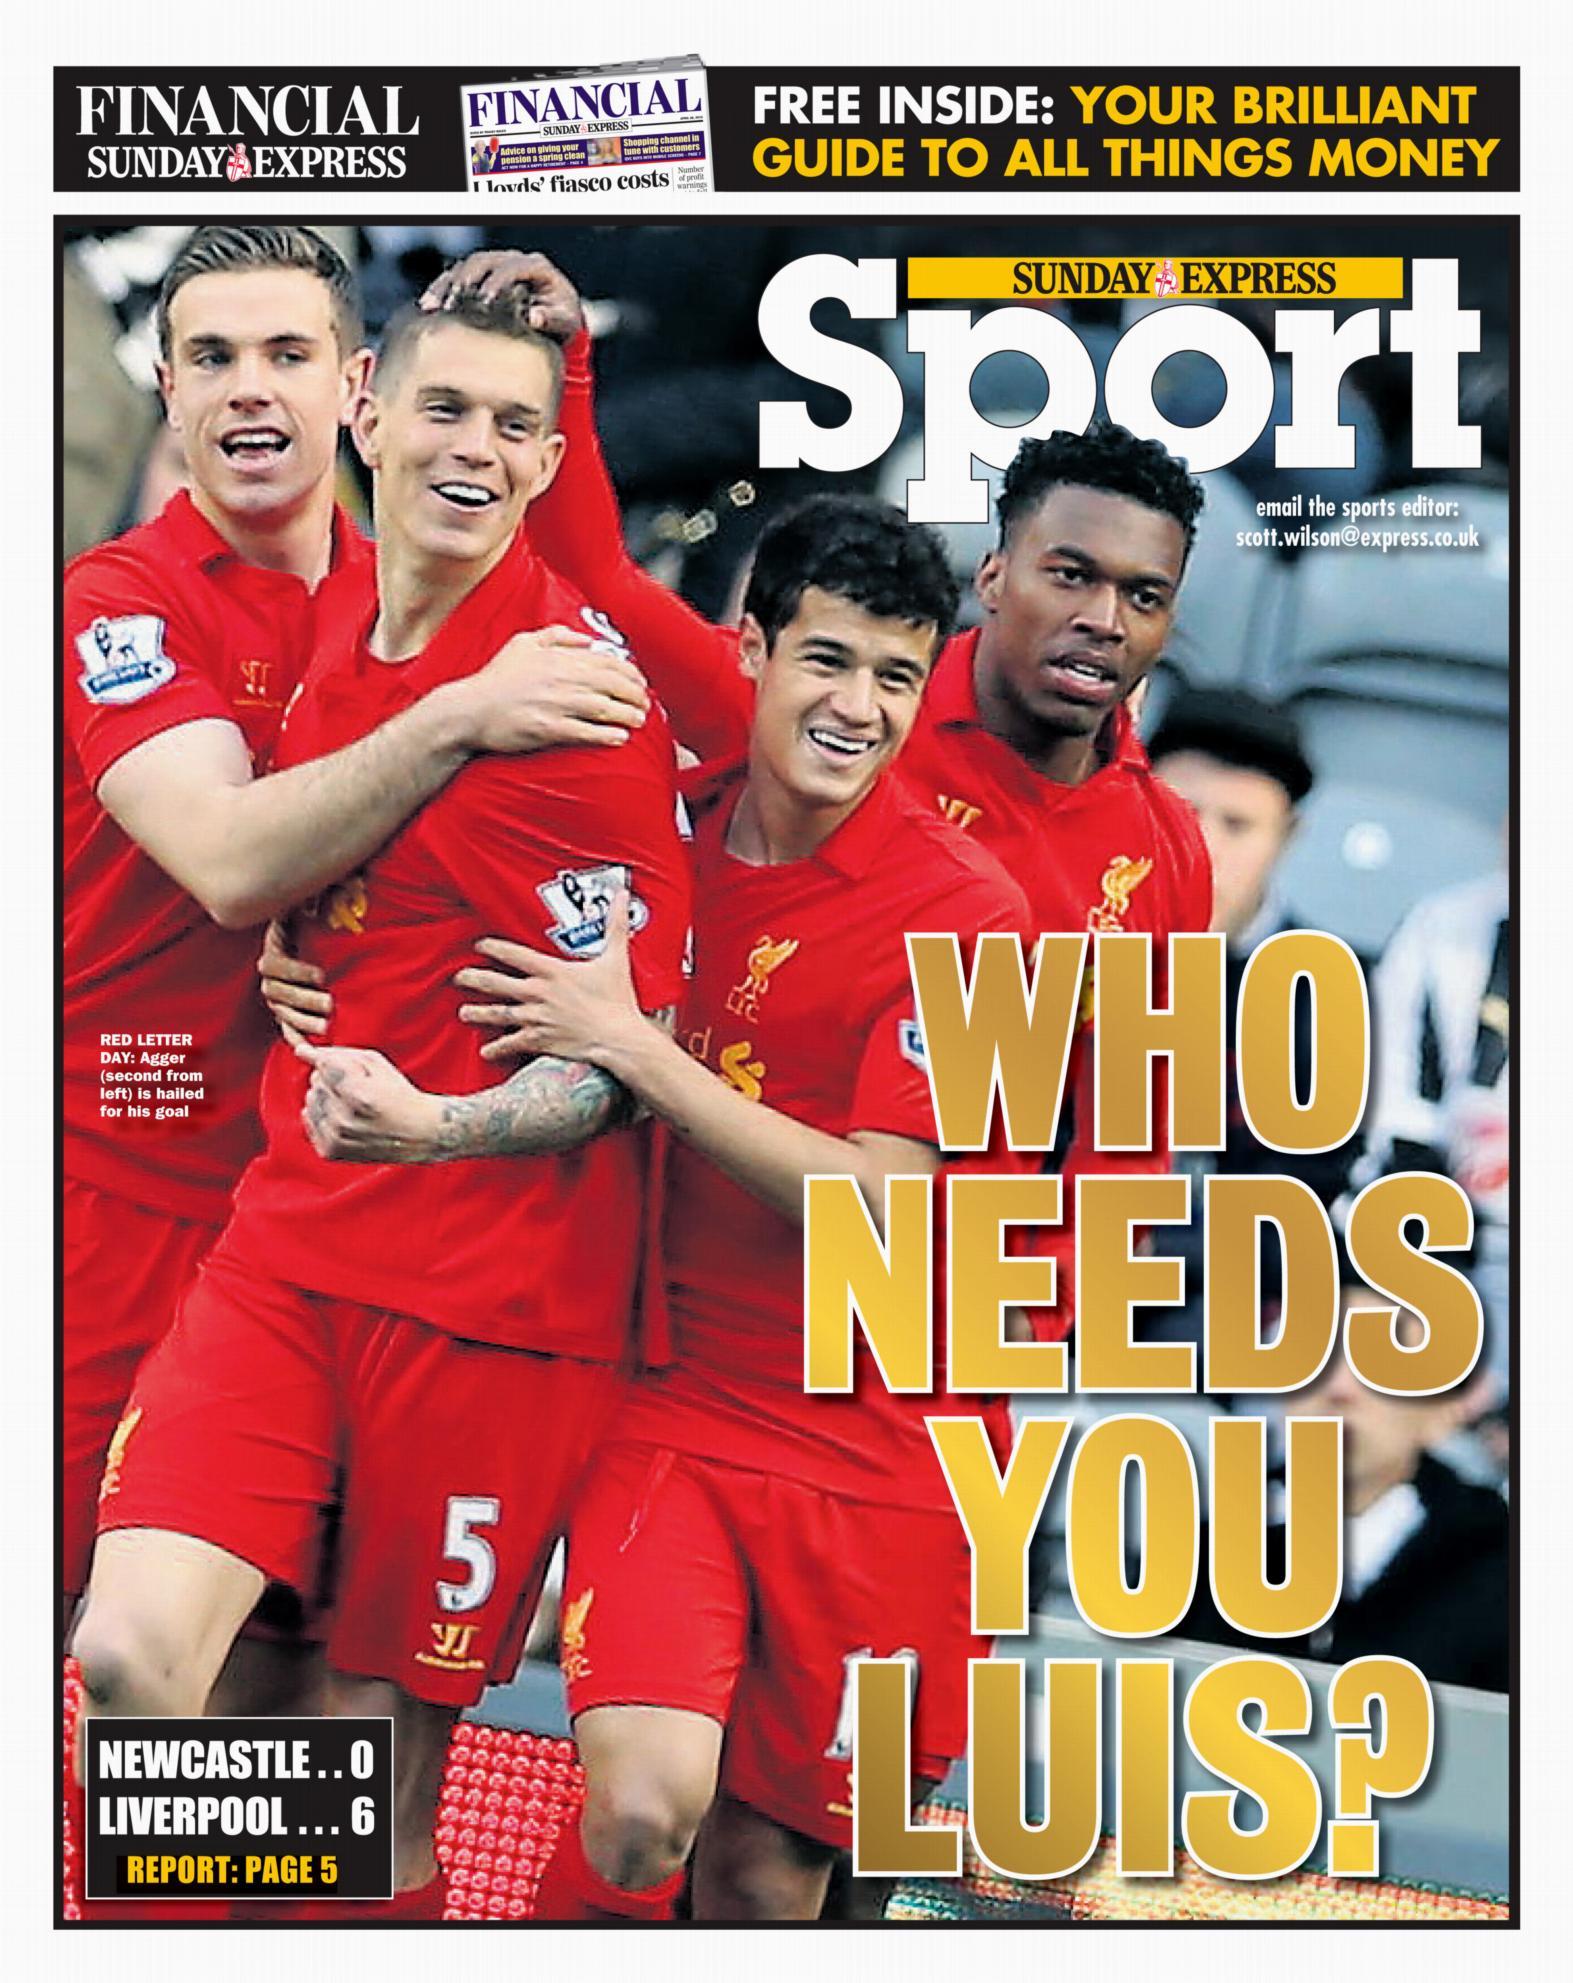 Sunday Express - Newcastle v Liverpool